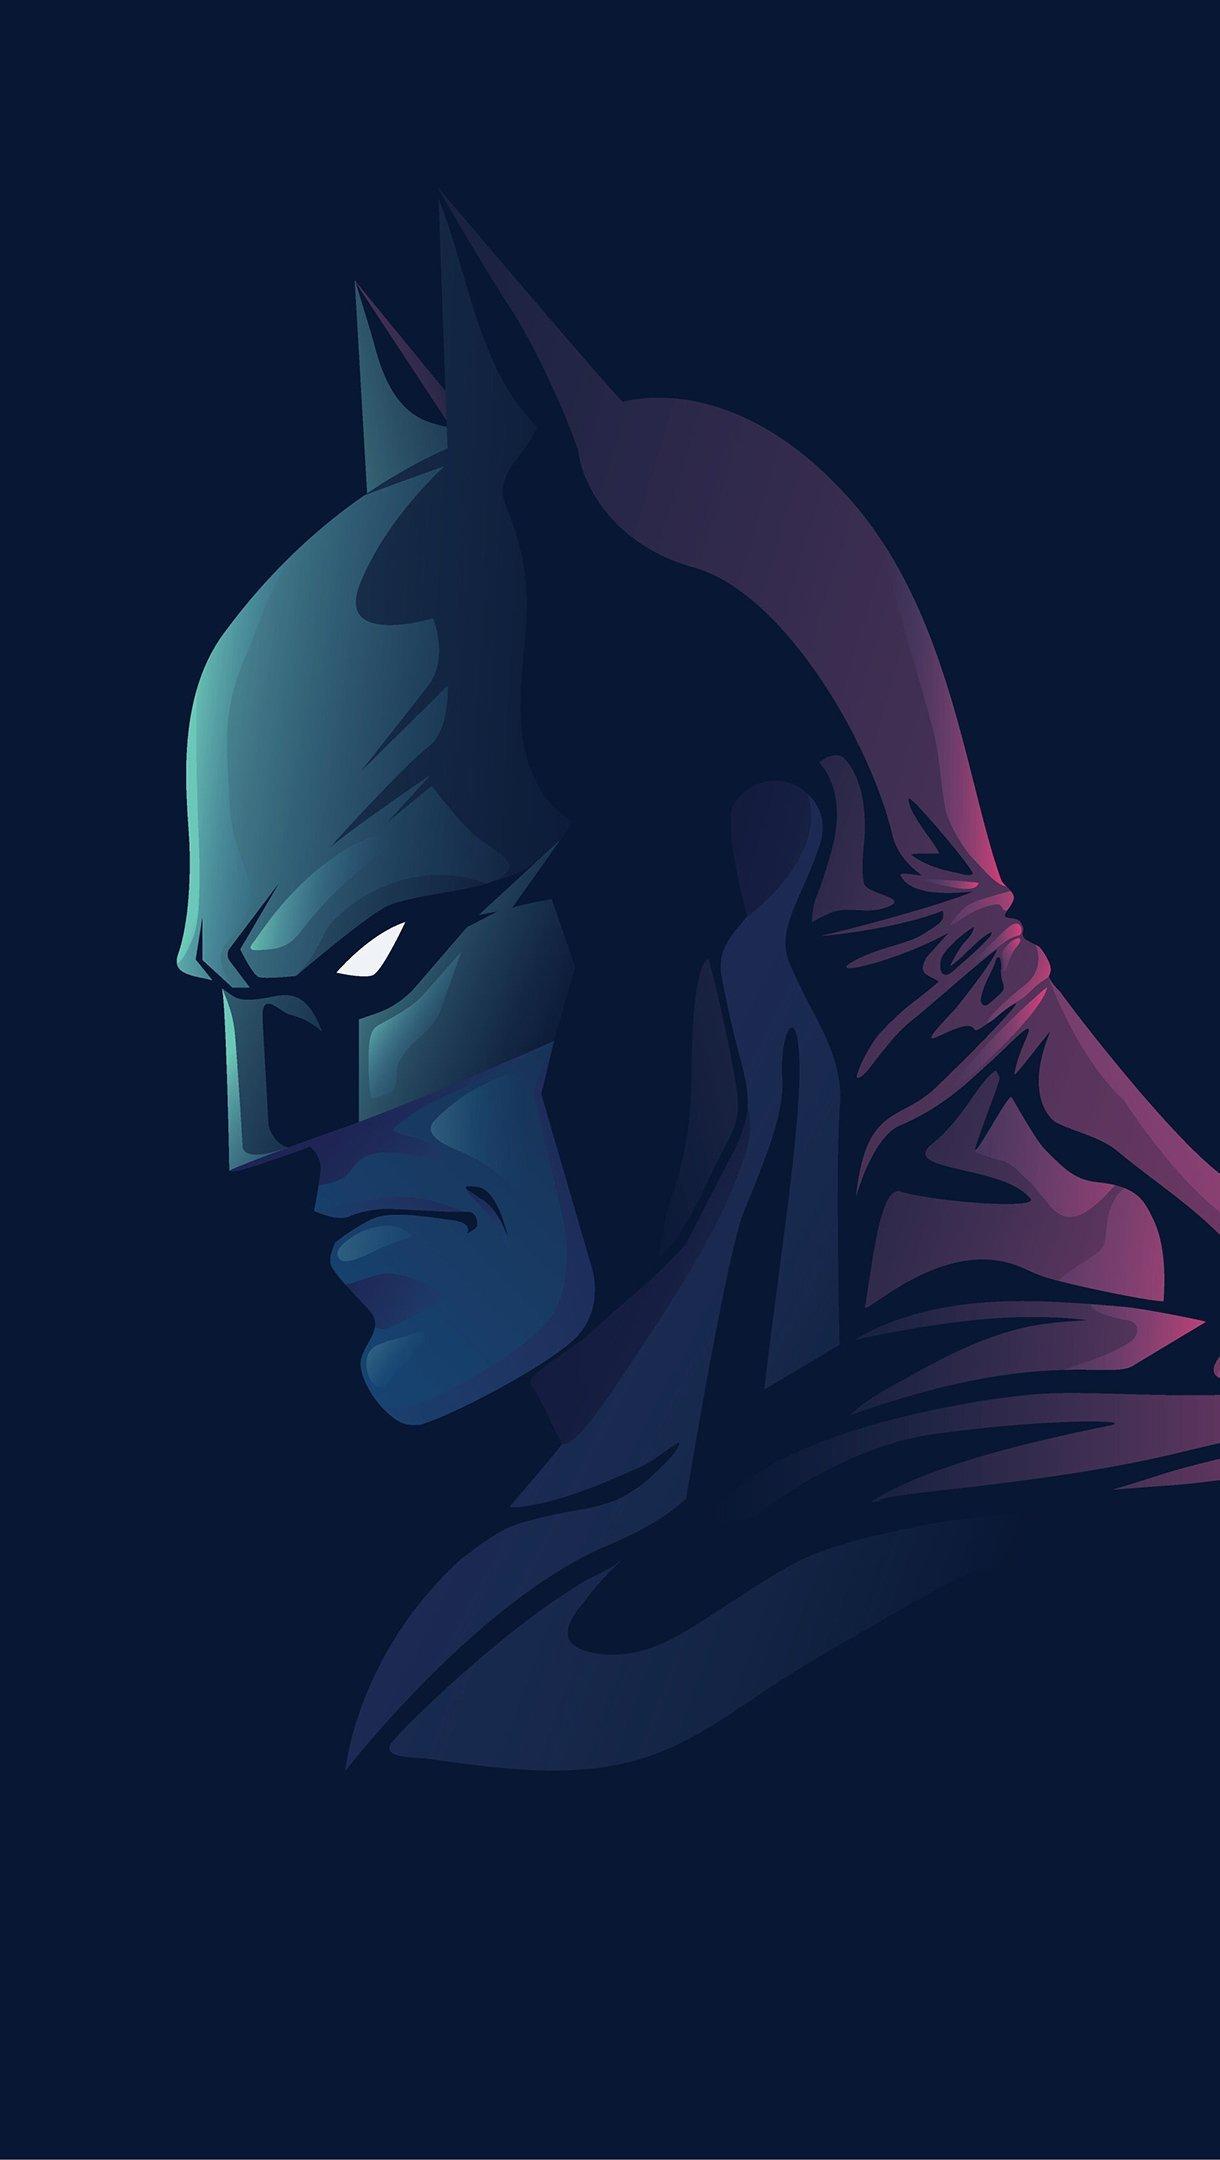 Wallpaper Batman Minimalist Vertical